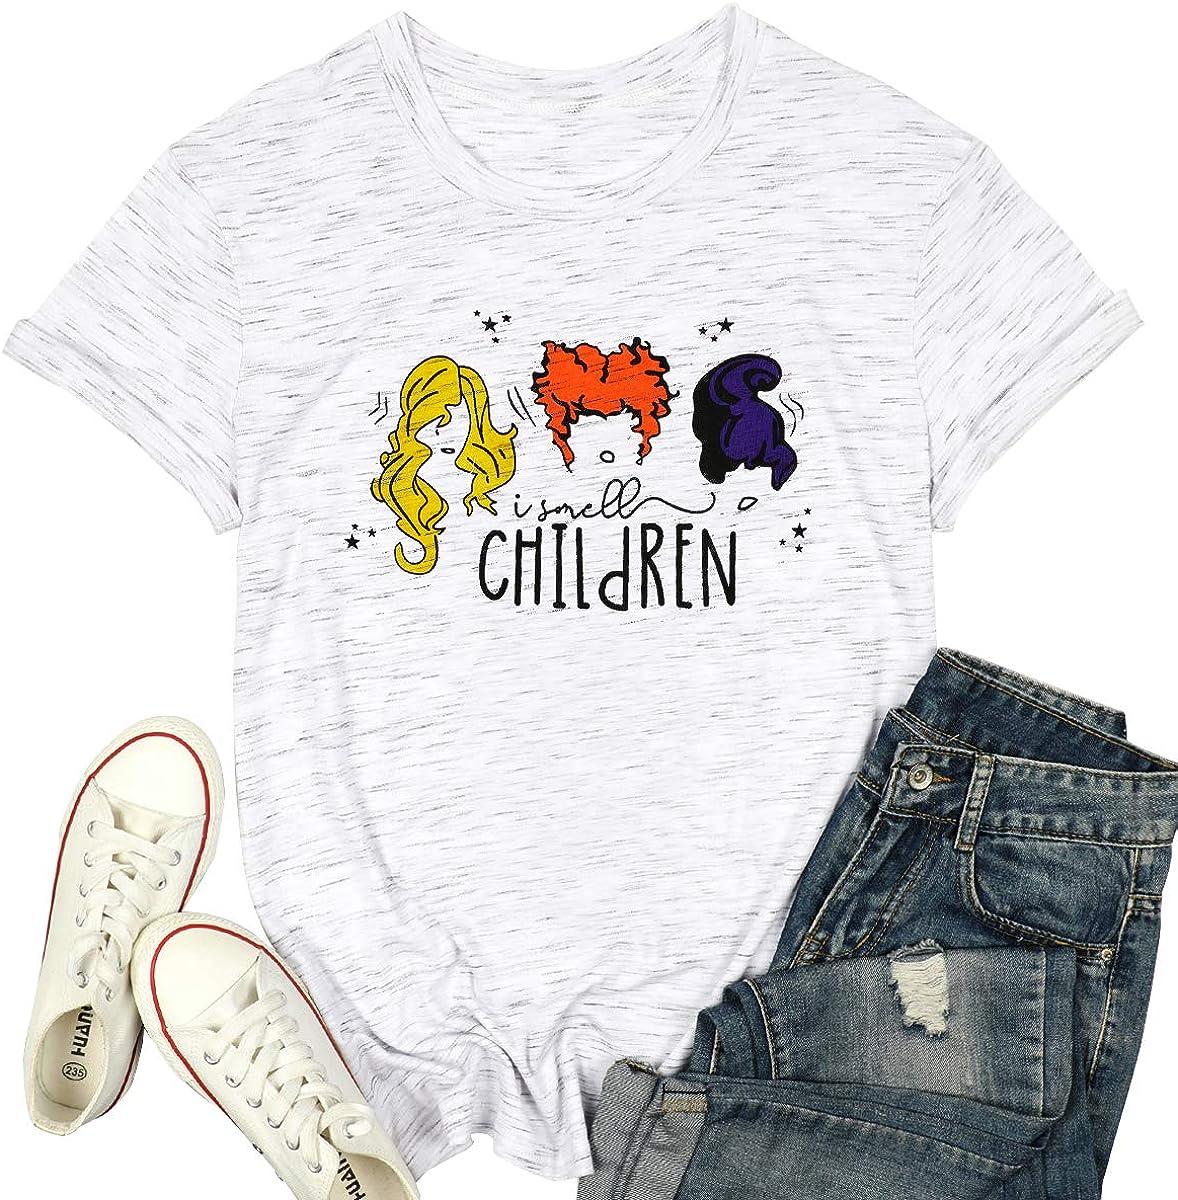 NANYUAYA I Smell Children Shirts Women Funny Halloween T Shirt Cute Sanderson Sisters Graphic Top Tee